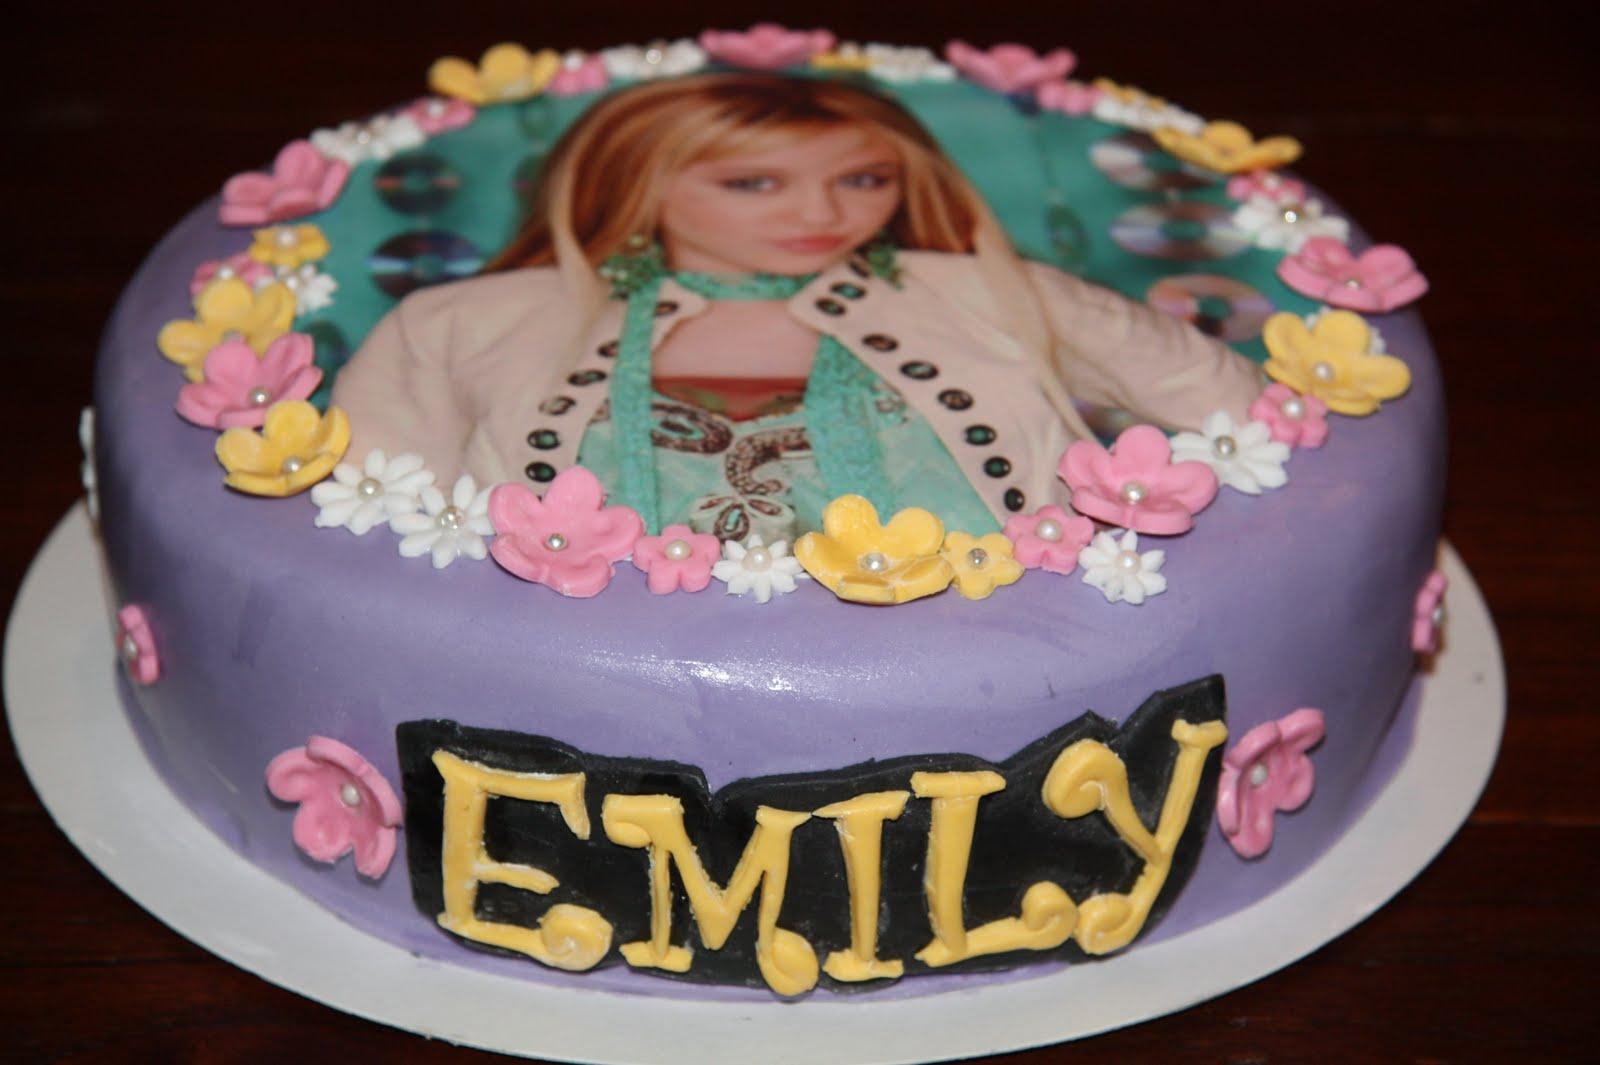 Remarkable 6 Hannah Montana Birthday Cakes 17 Photo Hannah Montana Birthday Birthday Cards Printable Inklcafe Filternl